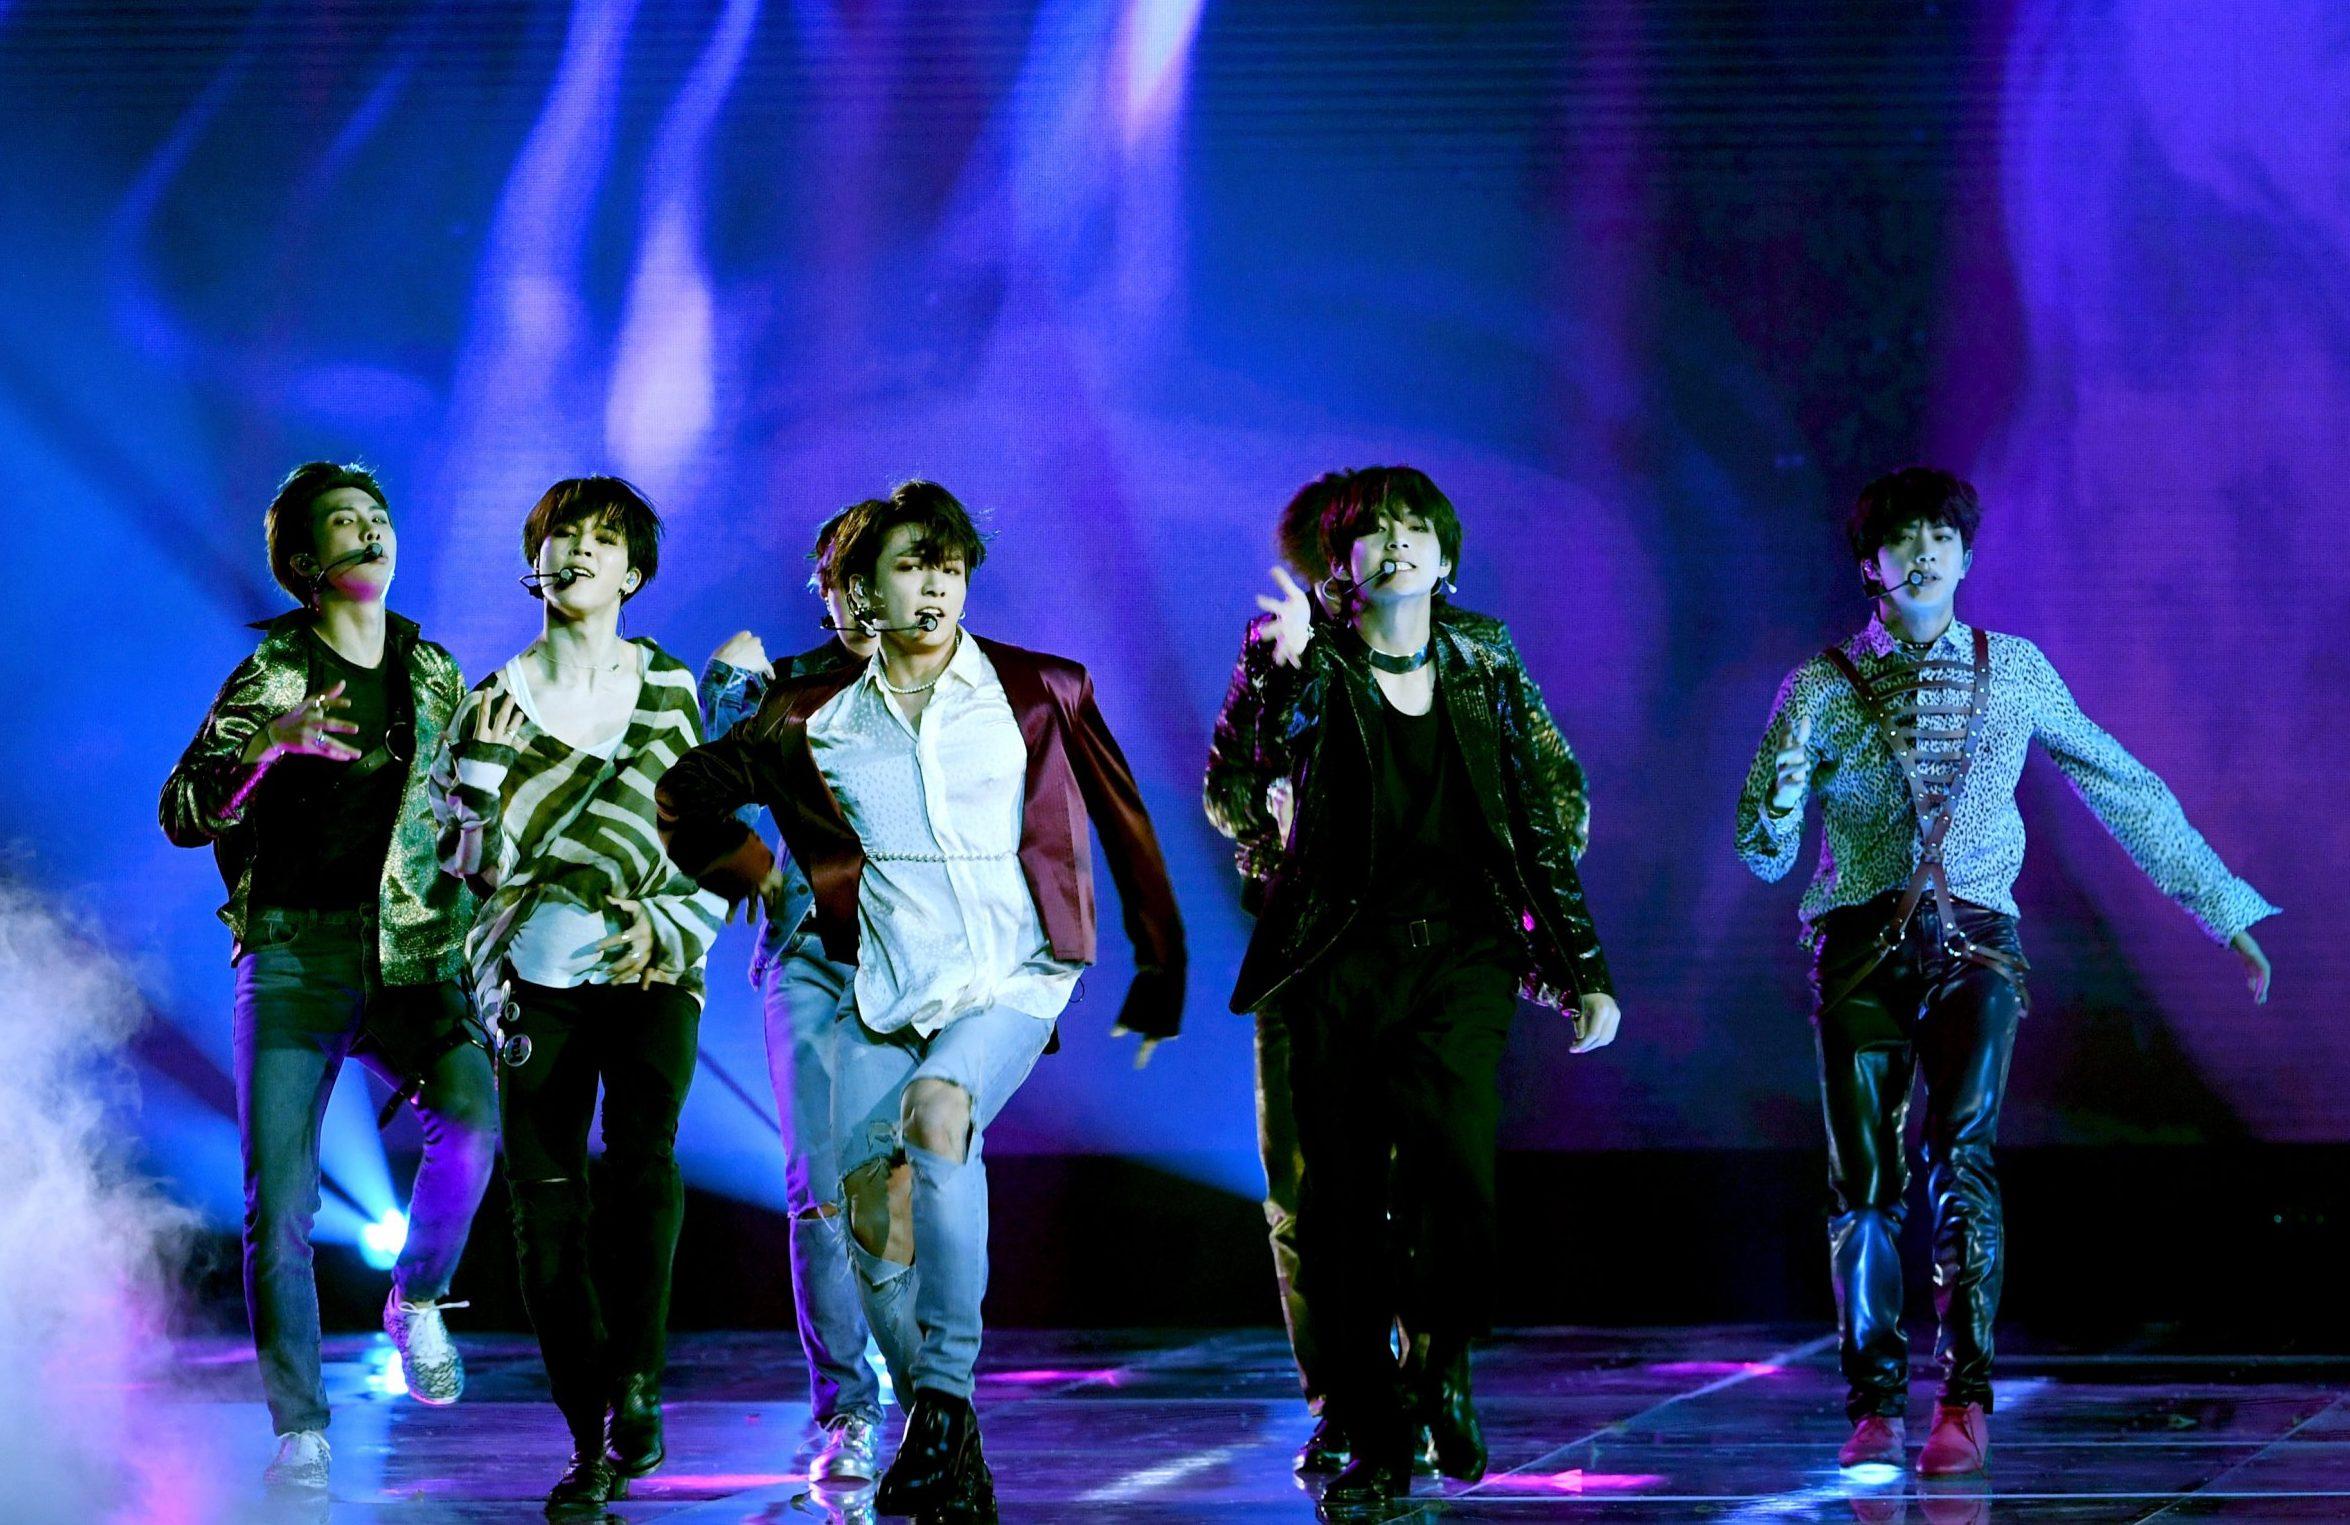 BTS smash Billboard Music Awards performance moments after winning top social artist award